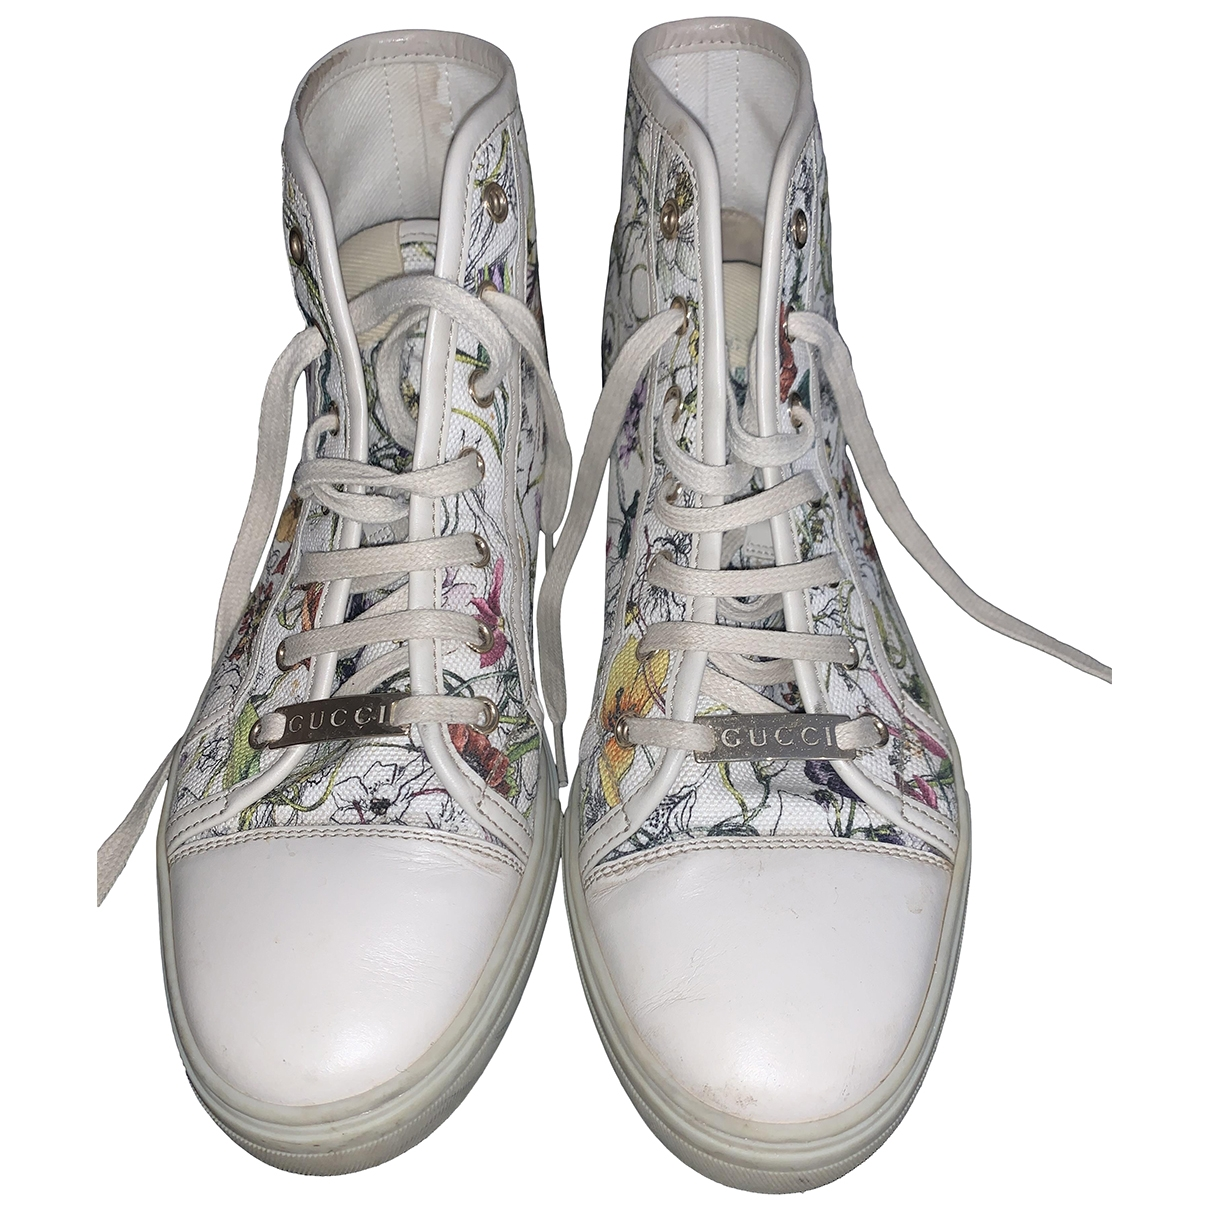 Gucci \N Sneakers in  Bunt Leinen